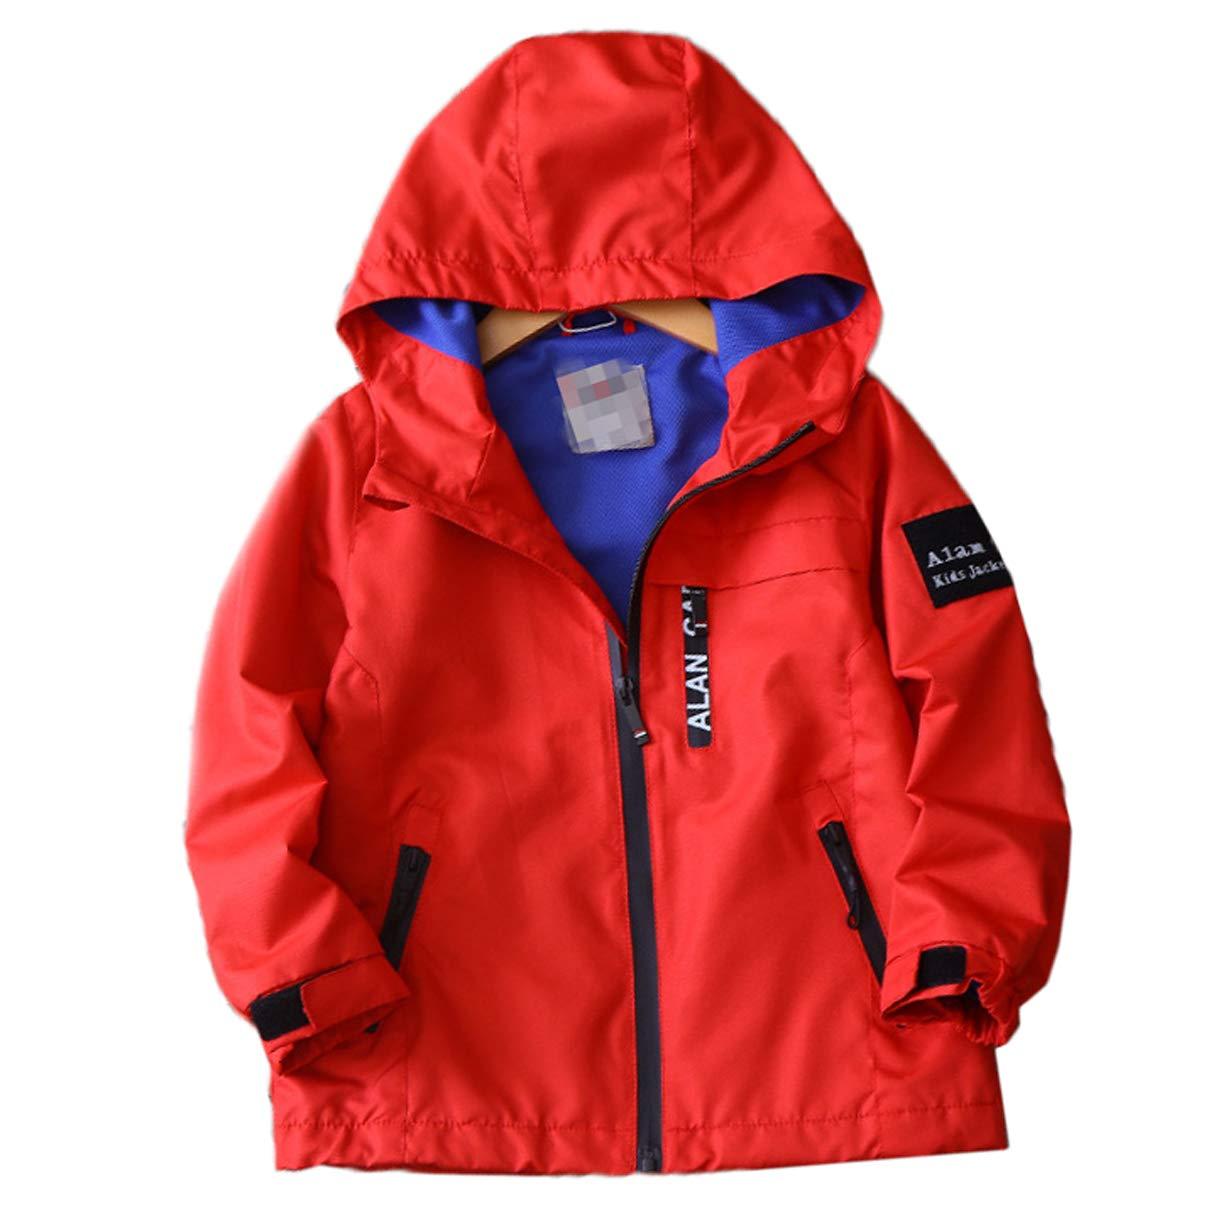 Zip Up Boys Hooded Windproof Hoodie Jackets Long Sleeve Sweatshirt Coat Jacket 2-14 Years